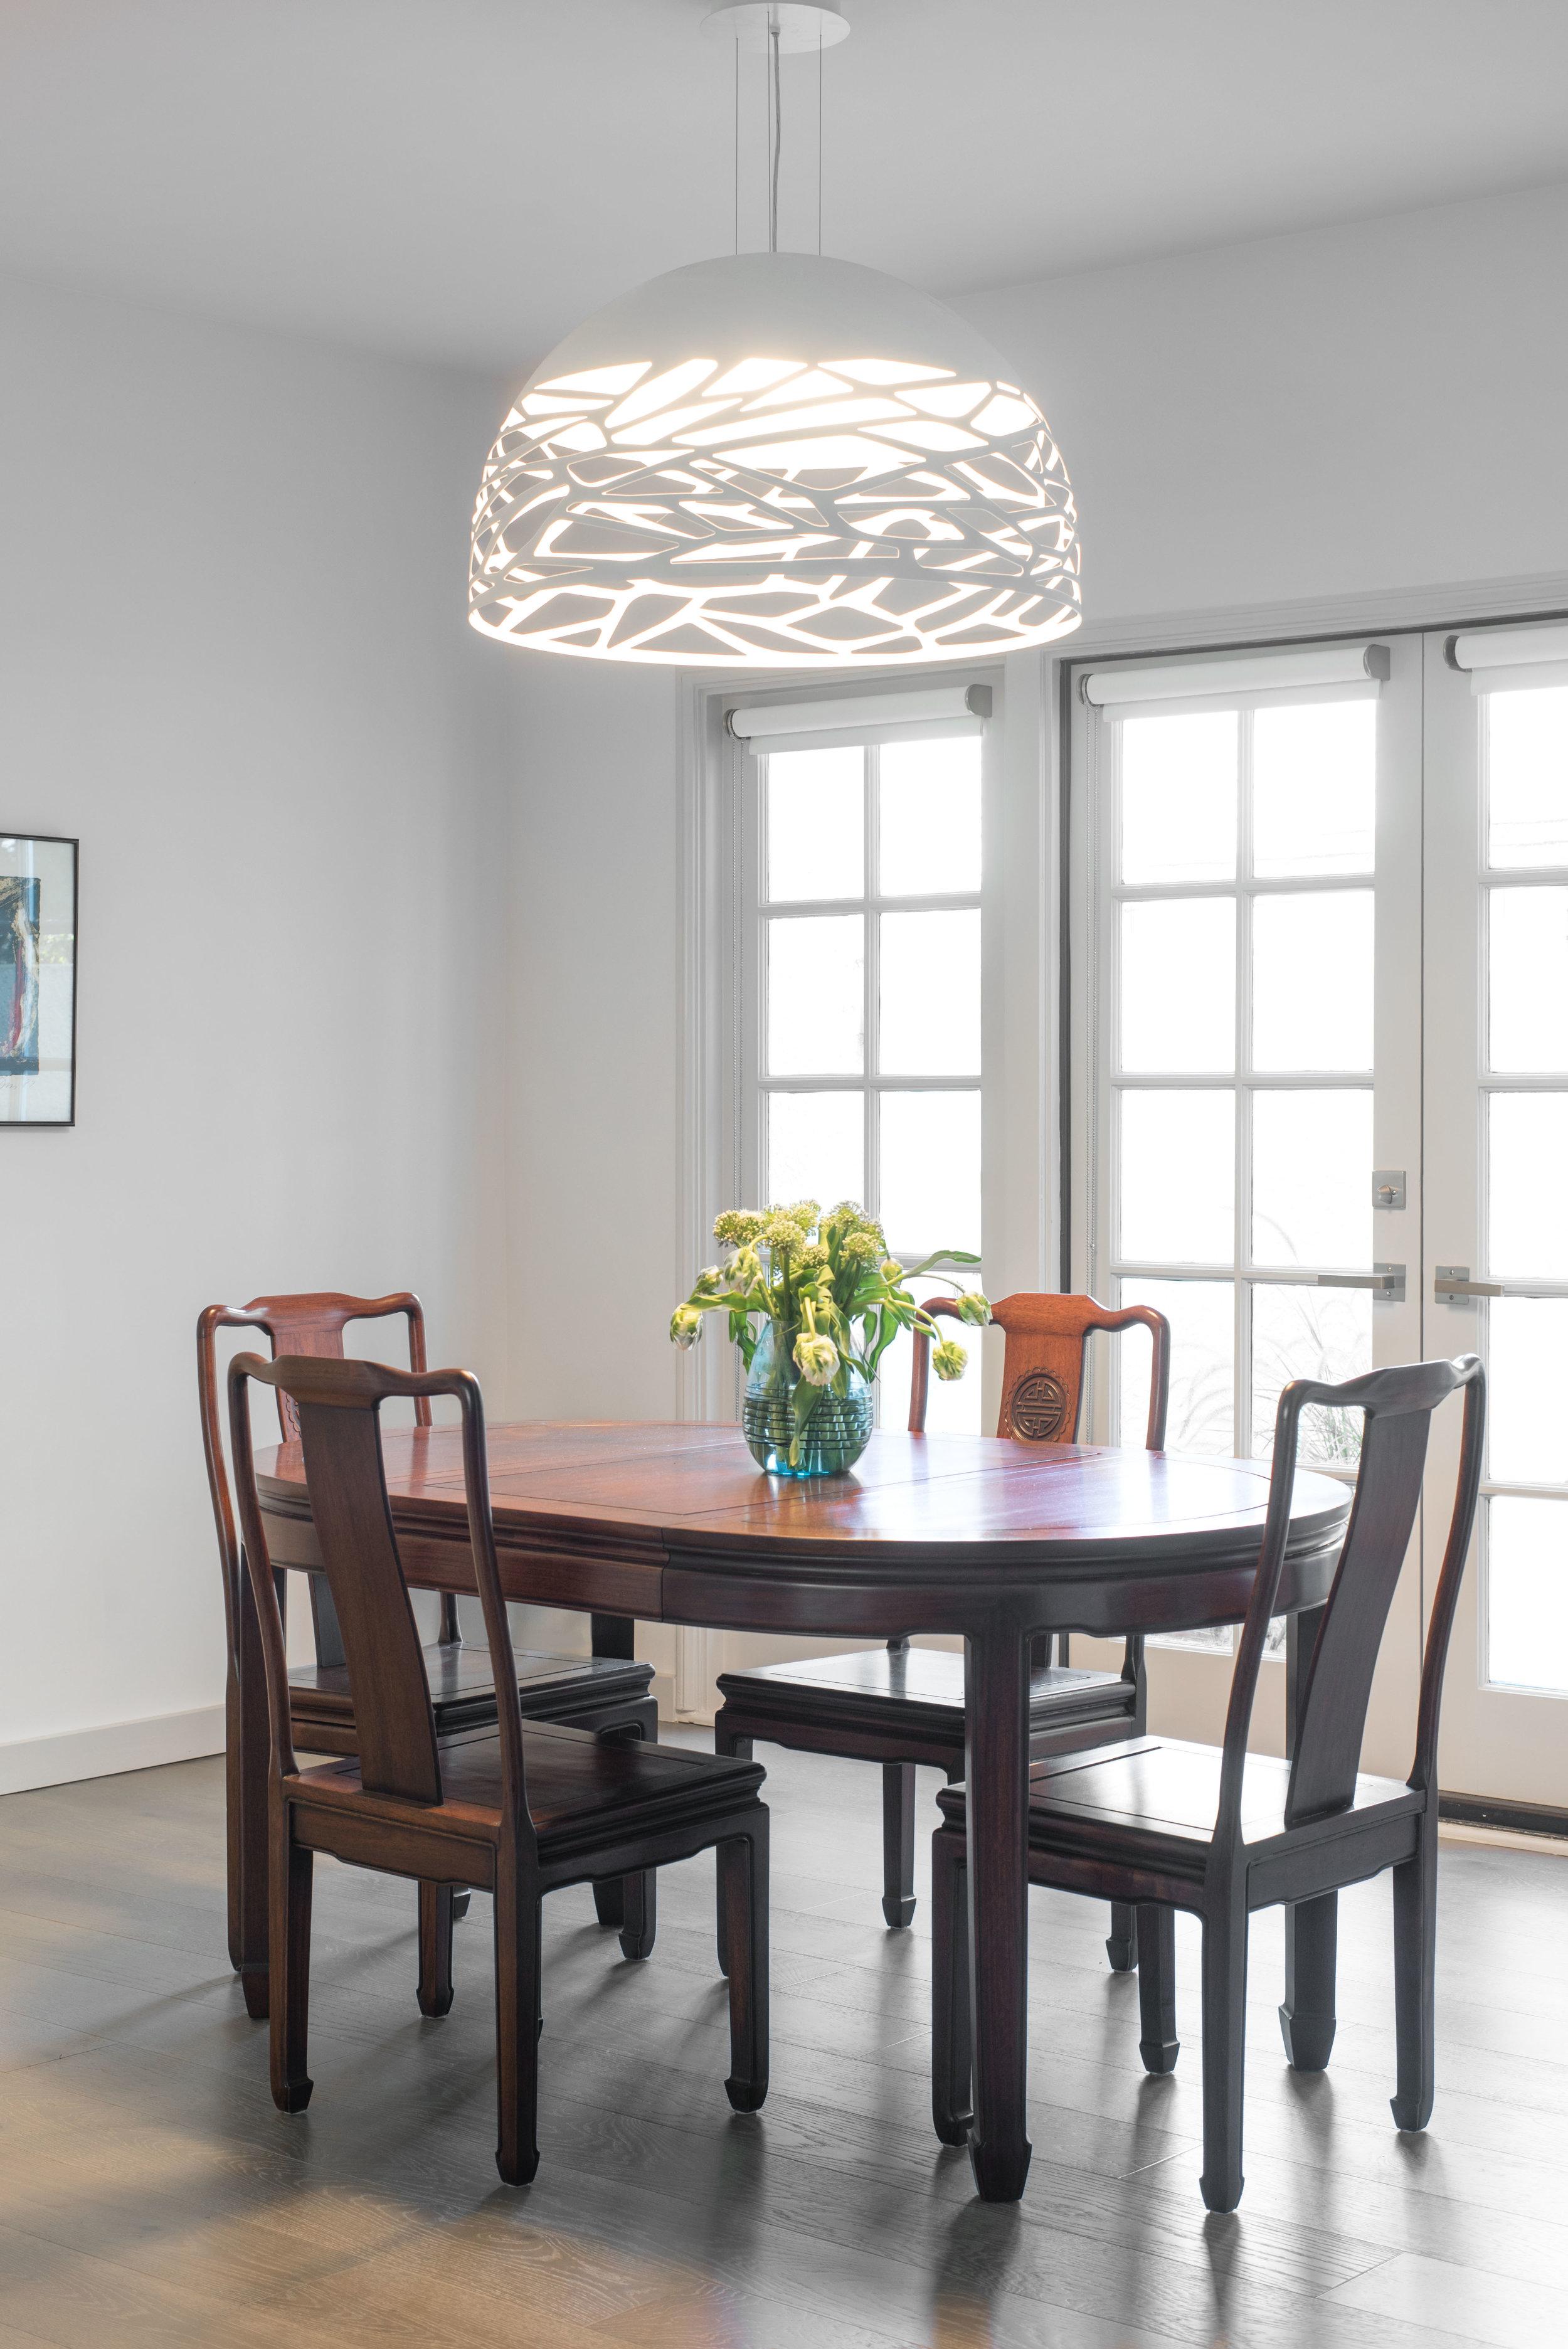 sarah-barnard-design-luxury-minimalism-santa-monica-02.jpg